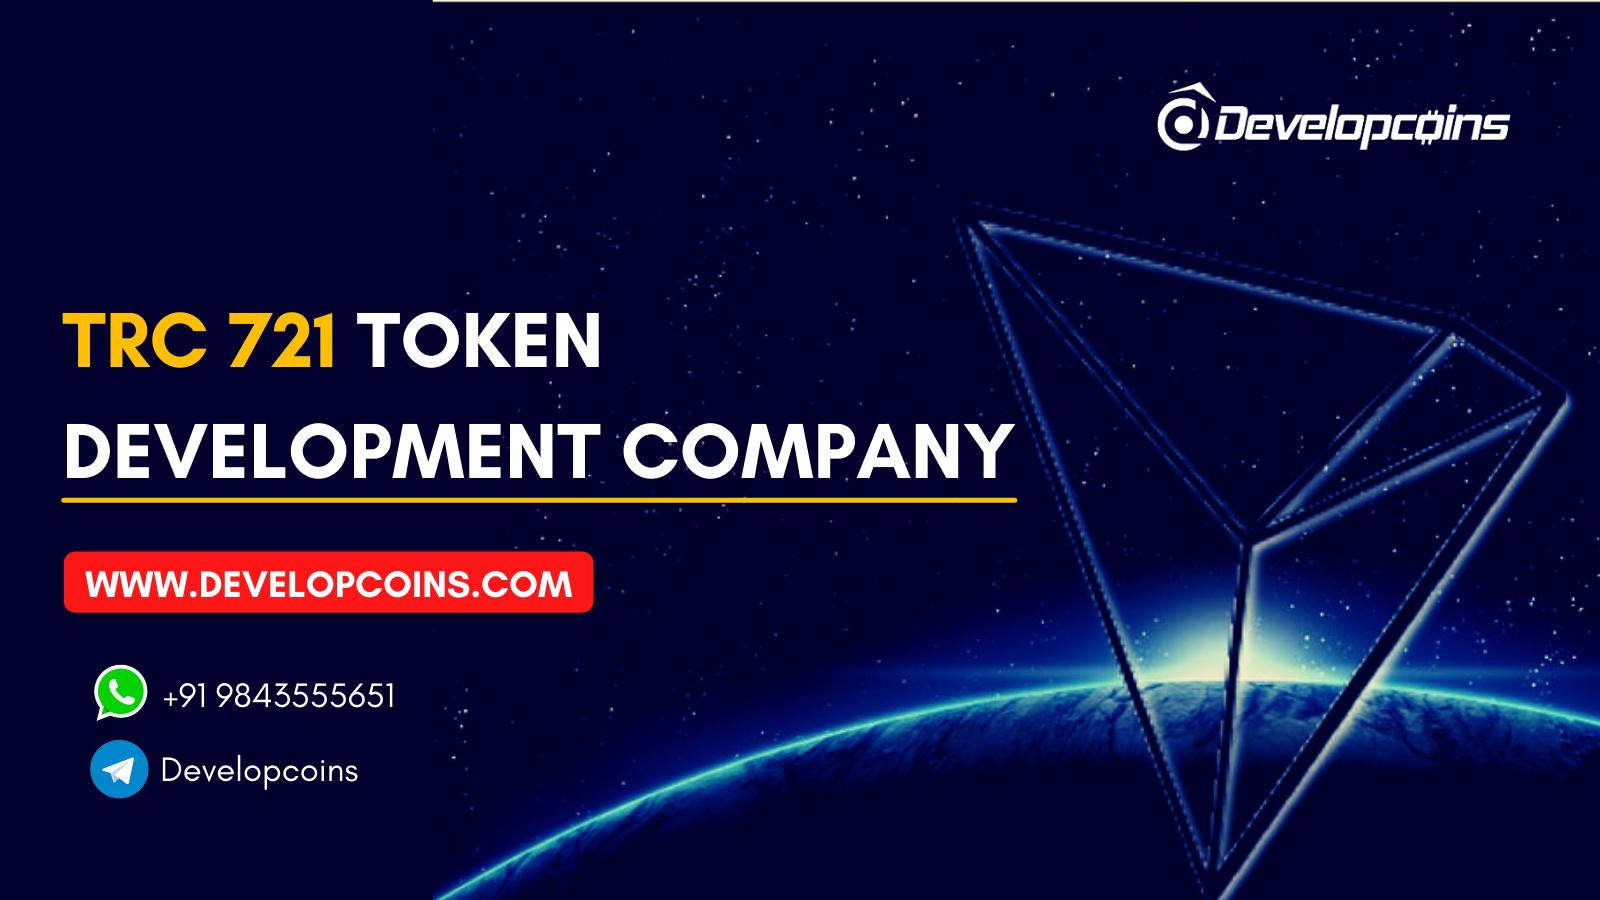 TRC 721 Token Development Company | Developcoins